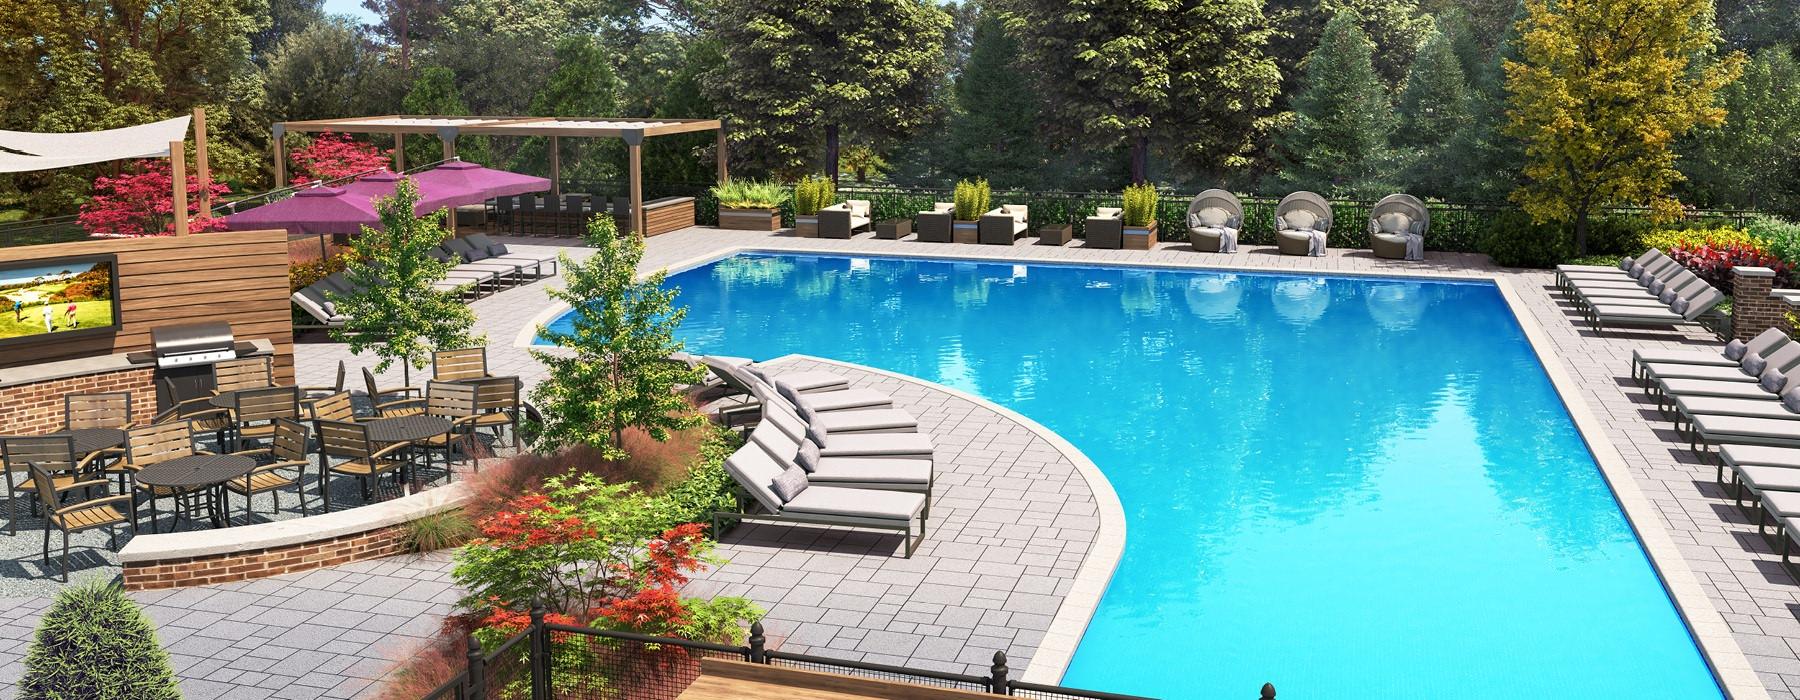 outdoor swimming pool rendering